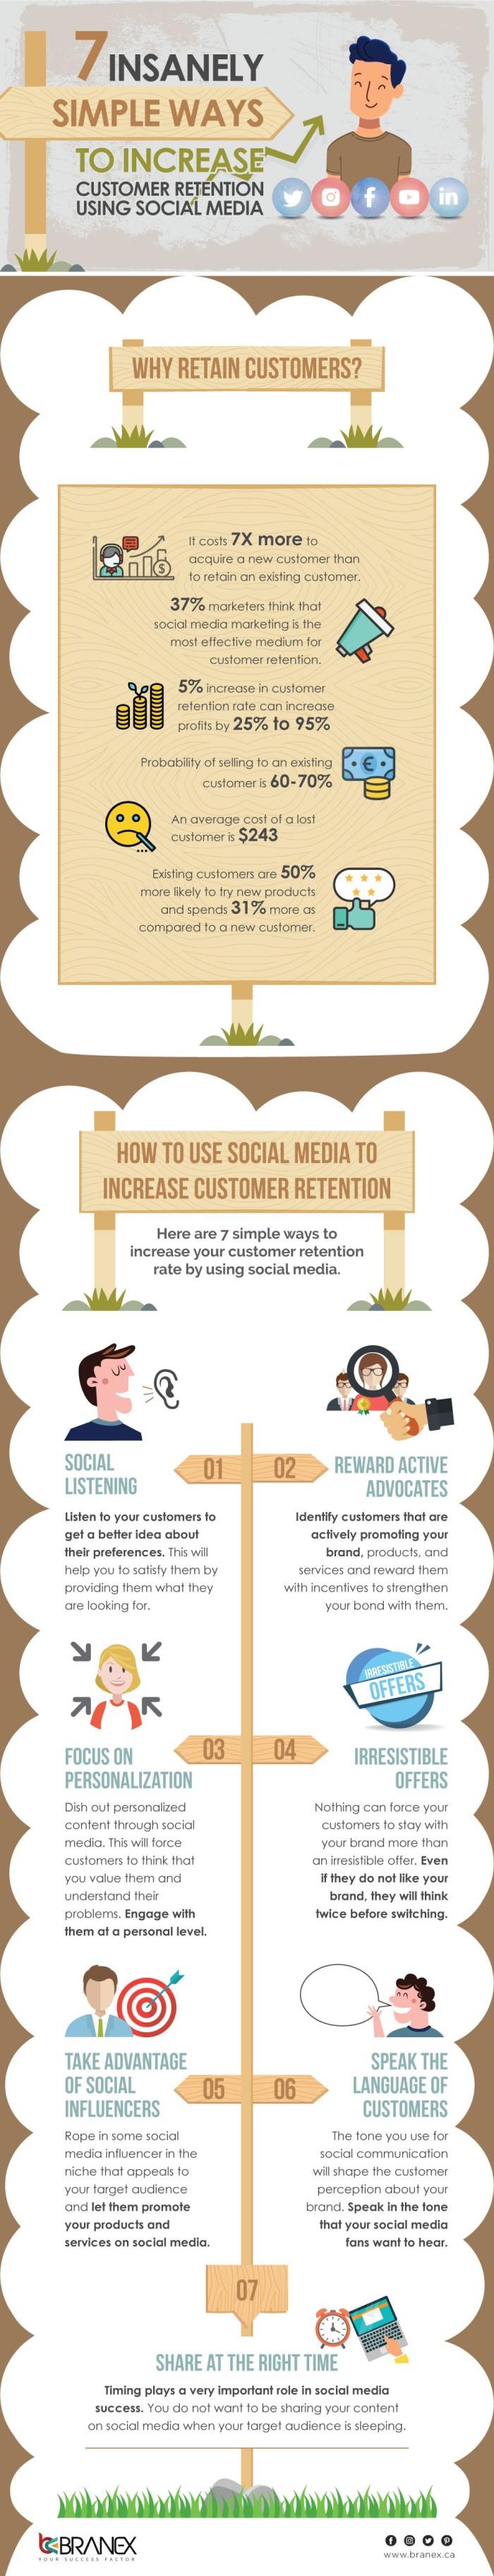 customer_retention_info.jpg